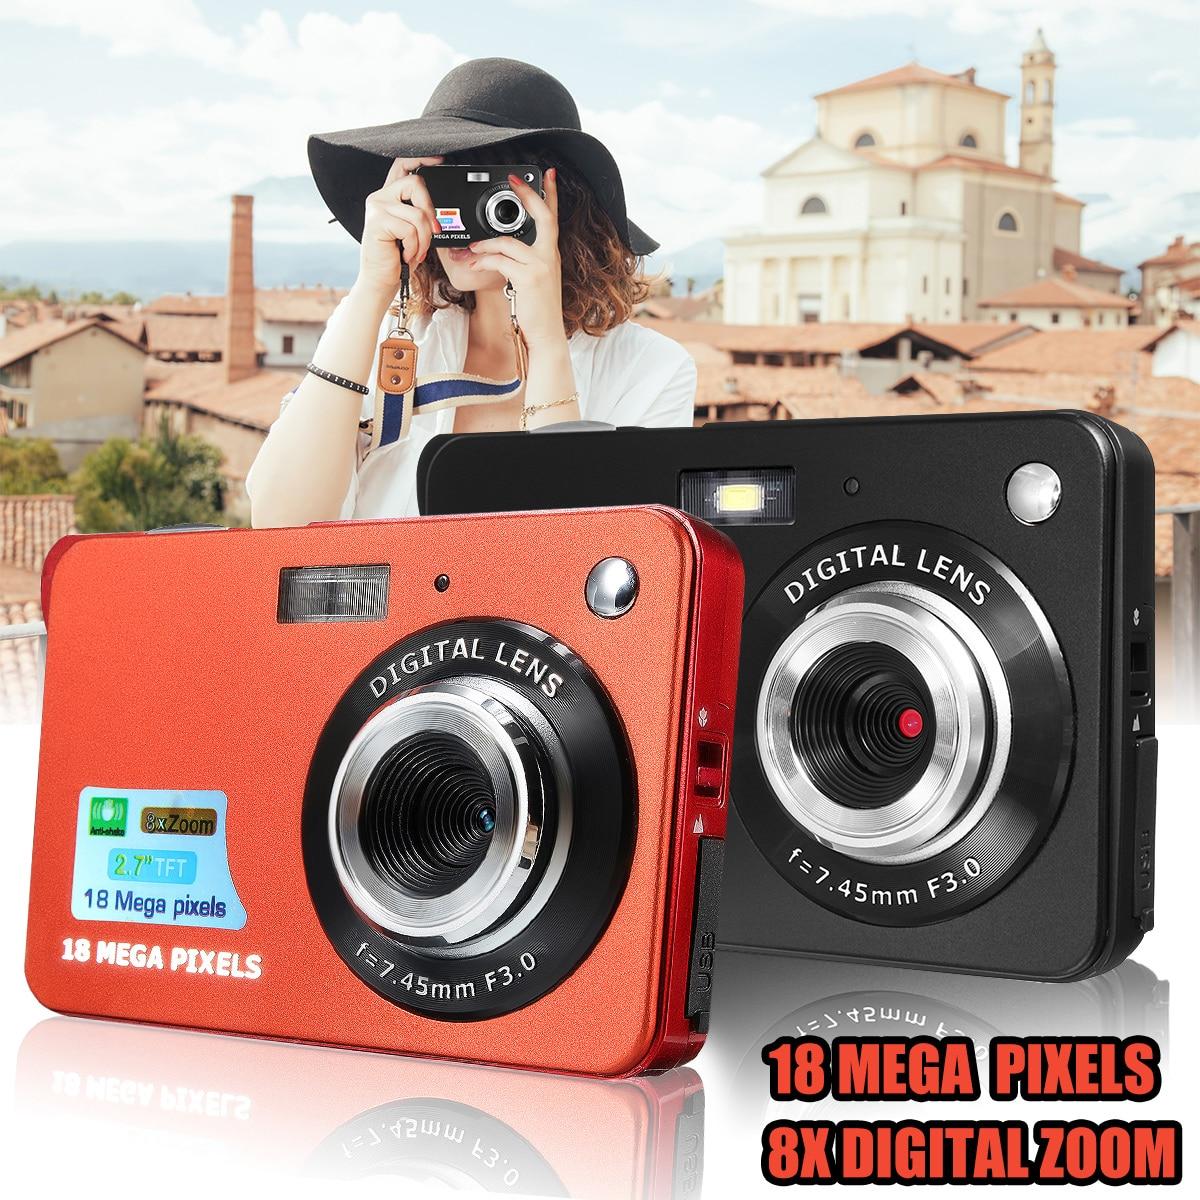 Portable mini caméra 2.7 720 P 18MP 8x Zoom TFT LCD appareil photo numérique hd caméscope vidéo Caméscope DV Anti-Shake Caméra